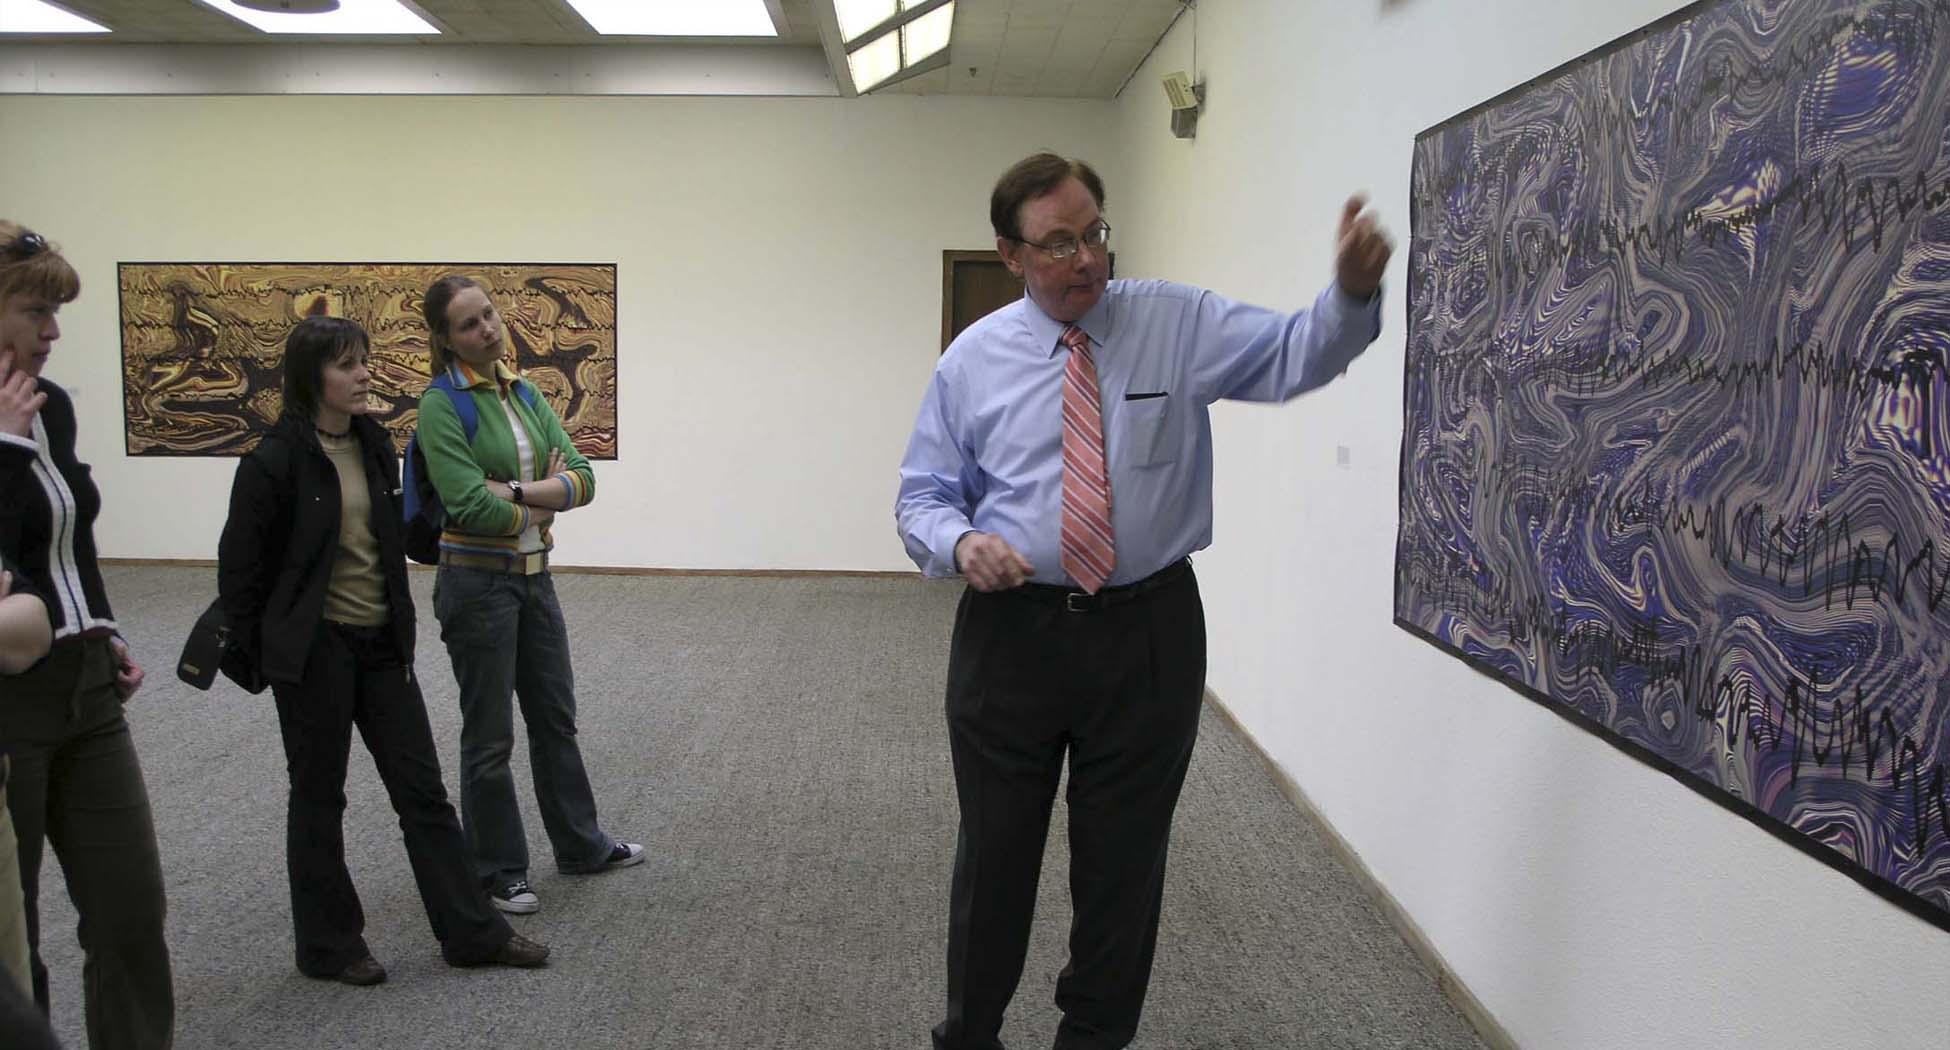 Presentation to art students